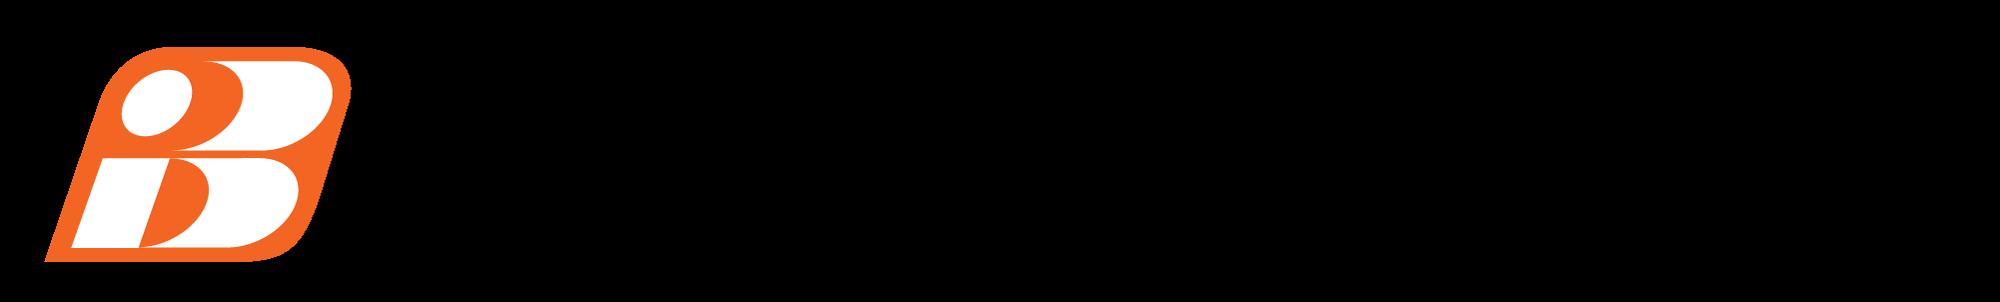 BrandID Logo